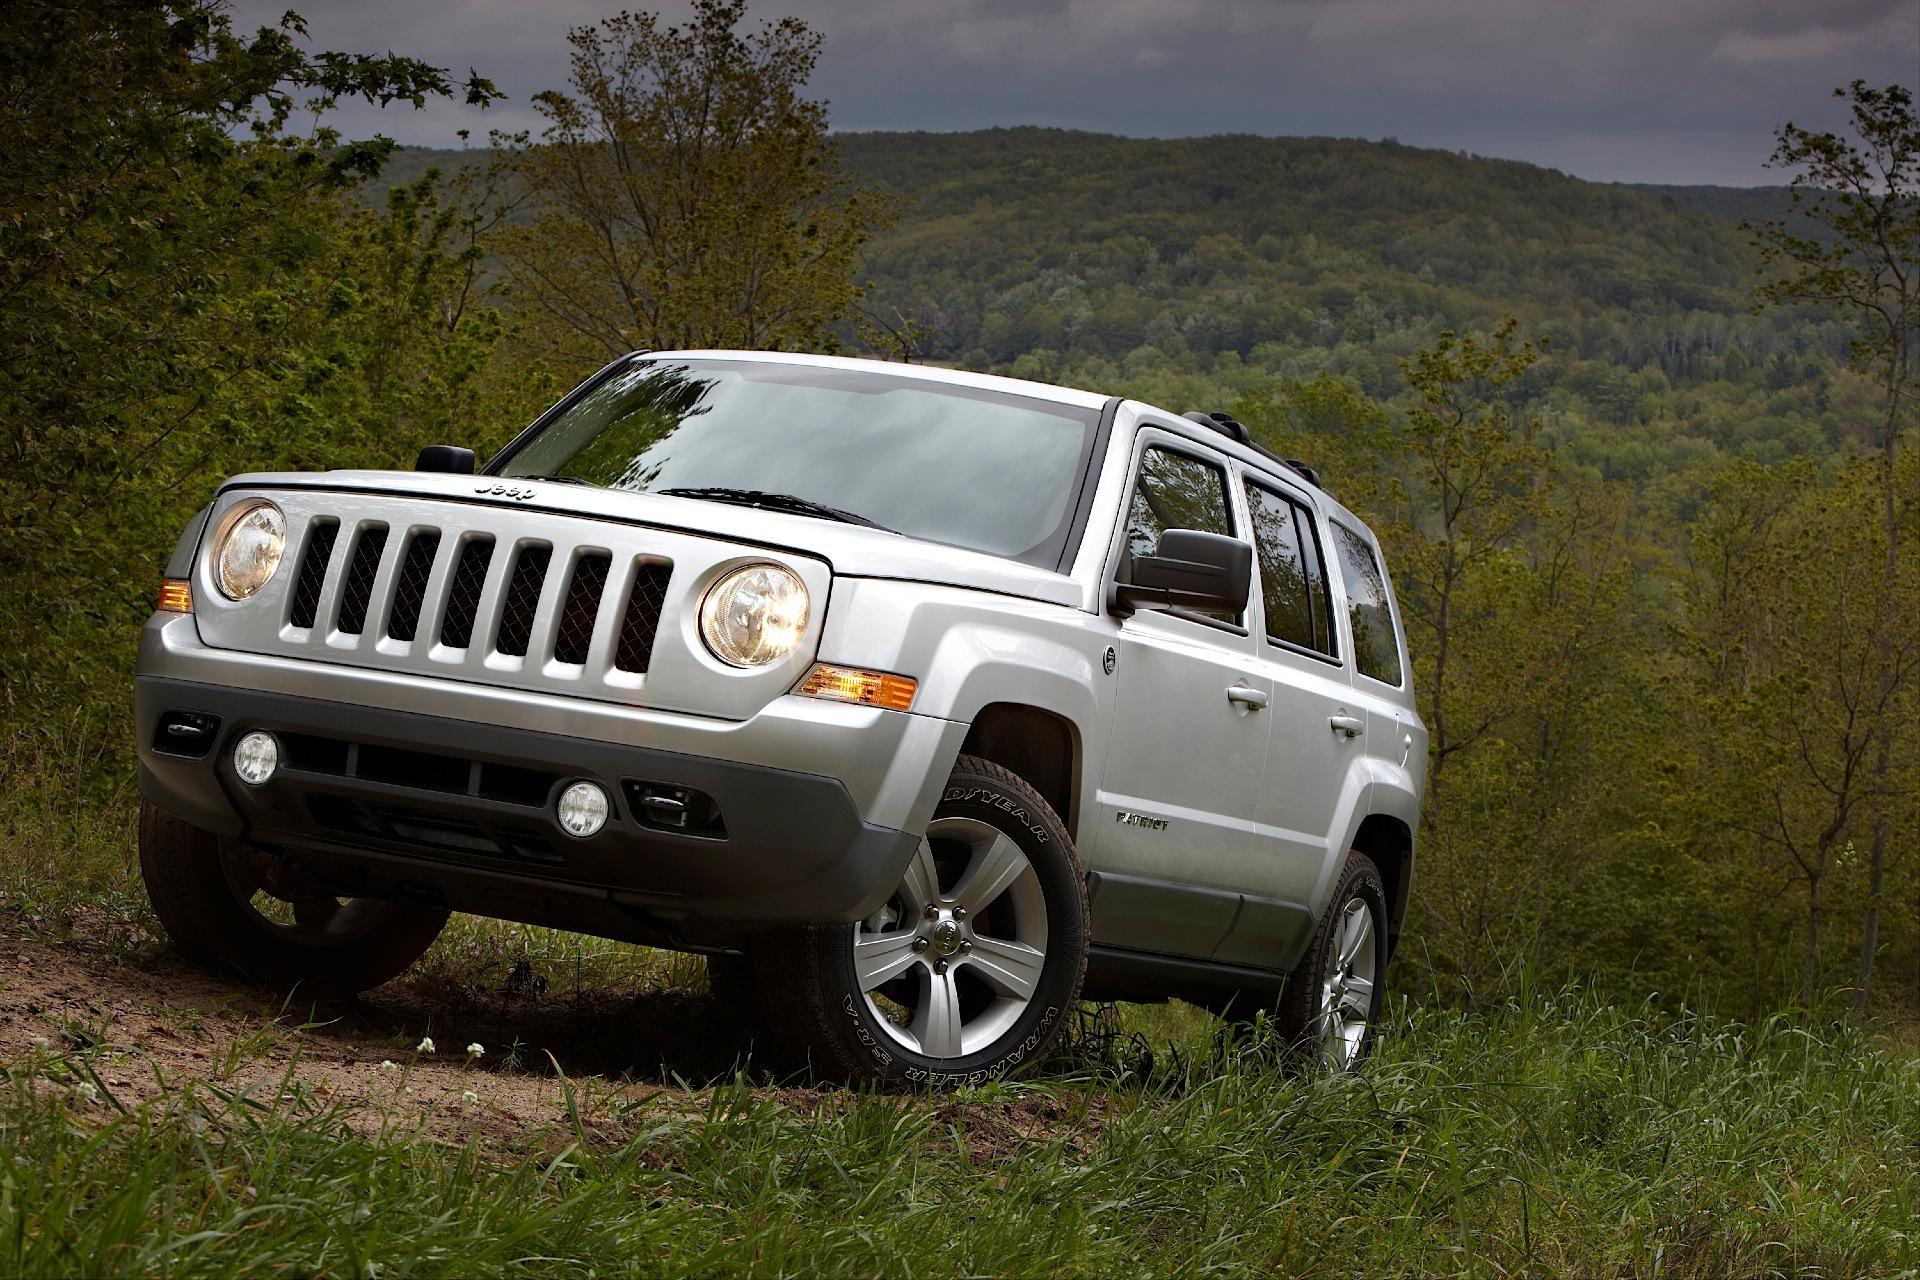 jeep patriot specs 2007 2008 2009 2010 2011 2012 2013 2014 autoevolution. Black Bedroom Furniture Sets. Home Design Ideas